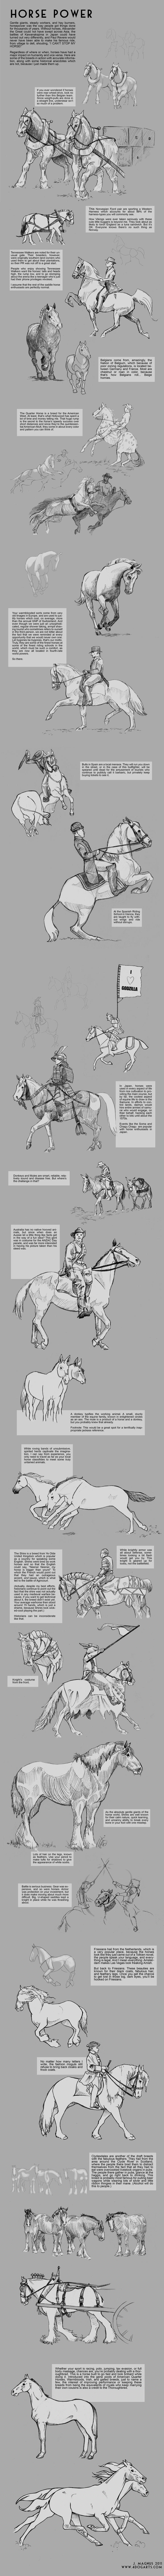 Horse Power Tutorial by sketcherjak on DeviantArt